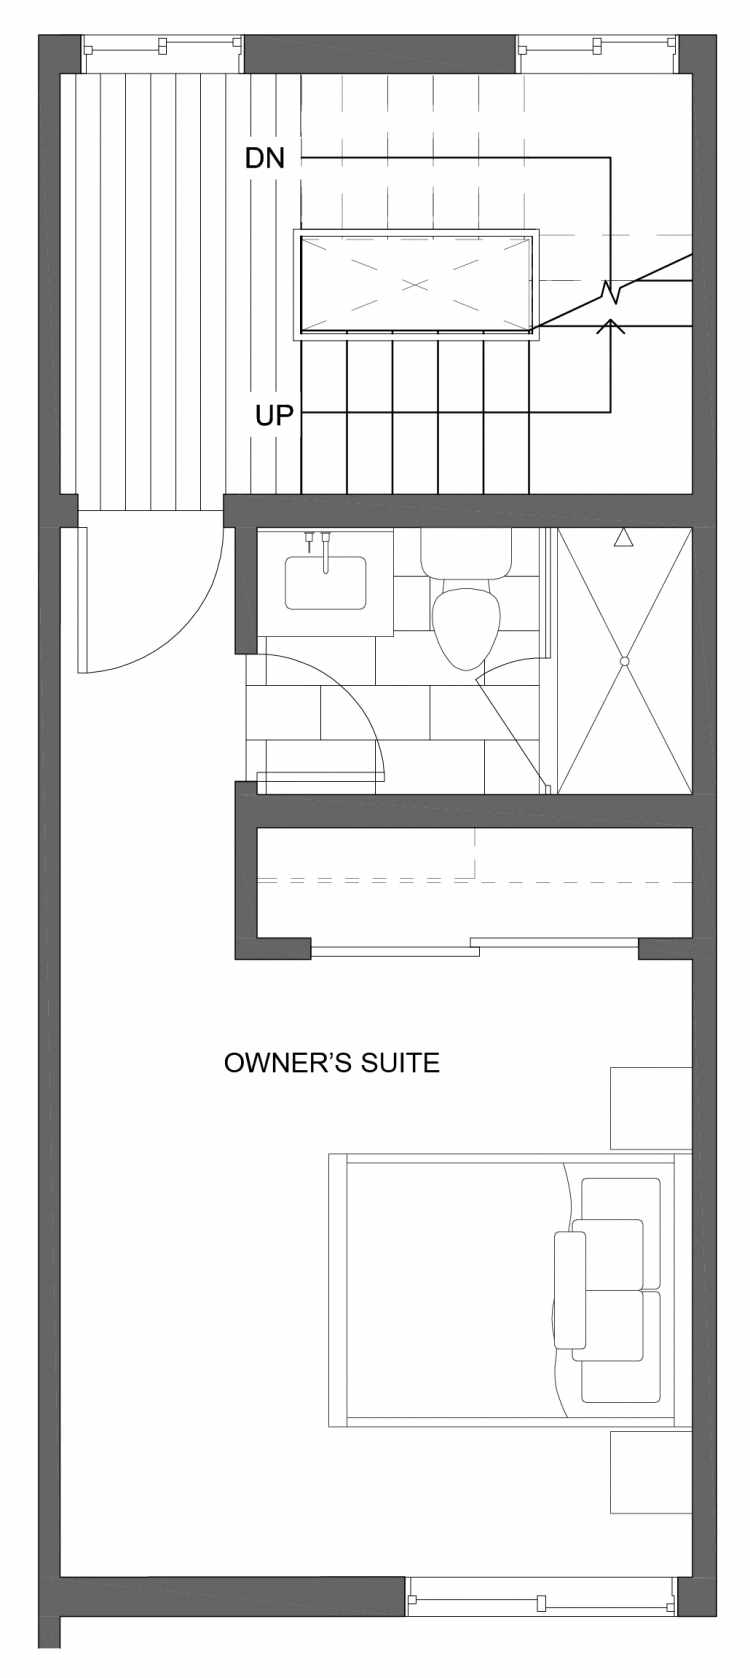 Third Floor Plan of 10429C Alderbrook Pl NW, One of the Jasmine Townhomes in the Greenwood Neighborhood of Seattle